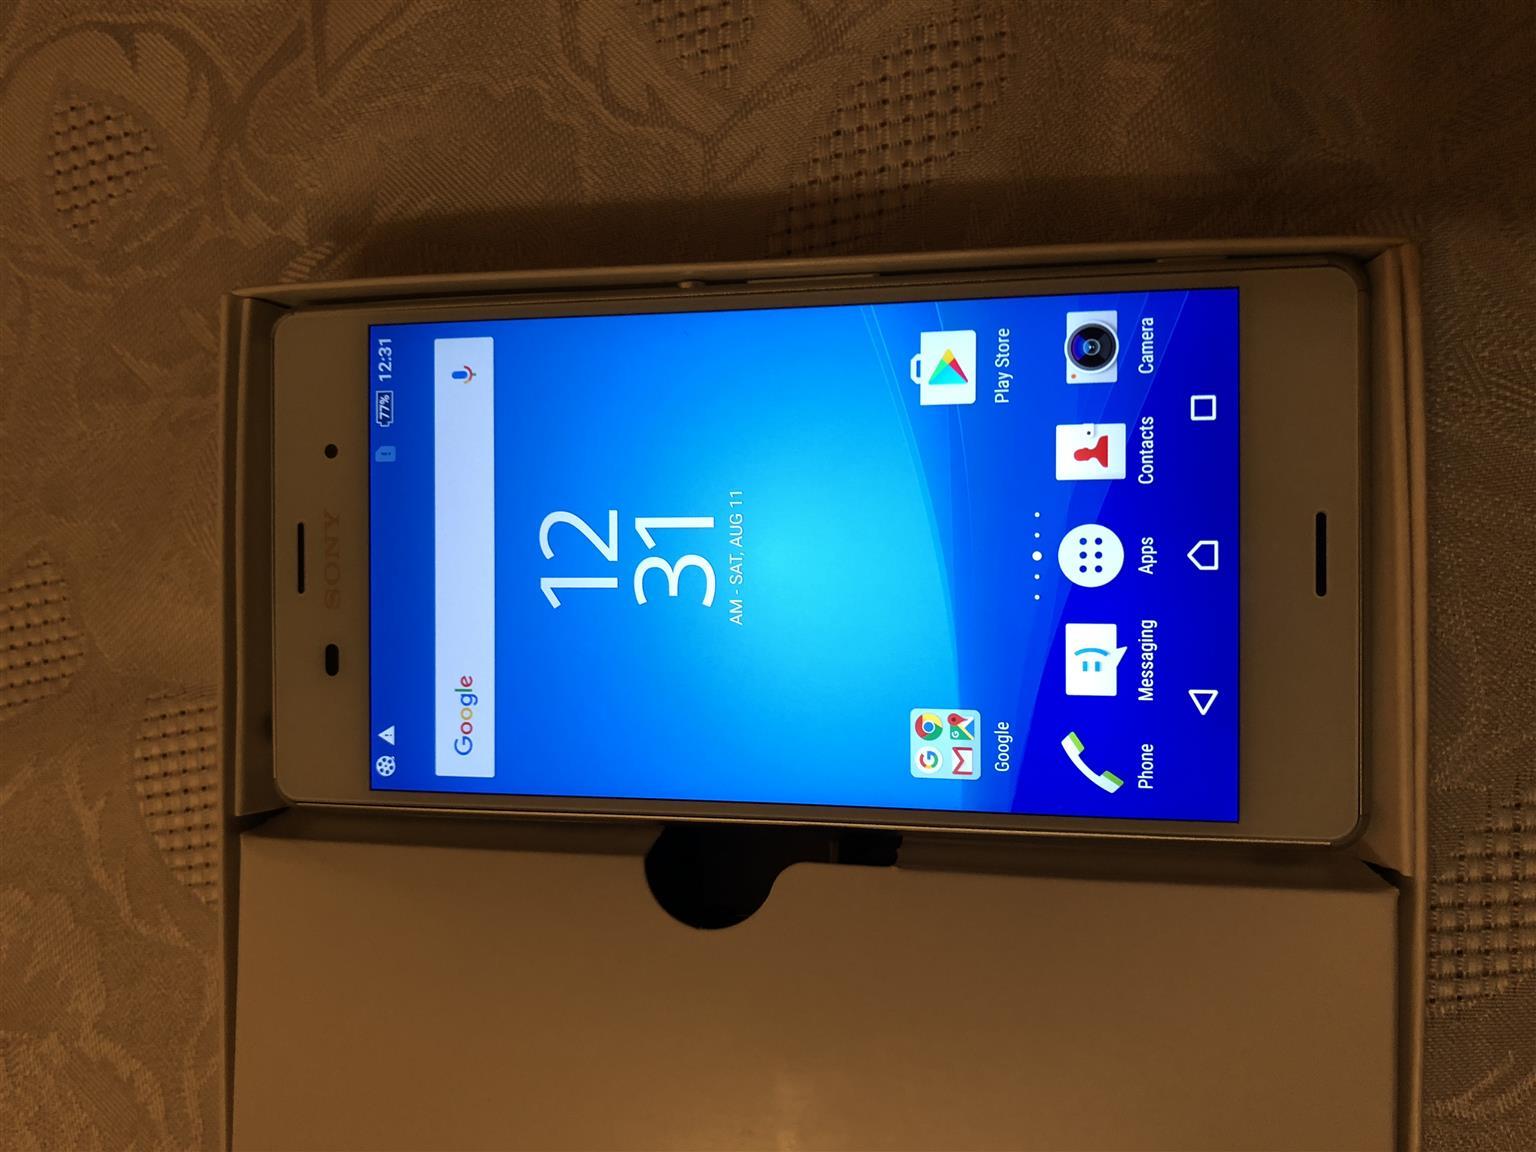 Promo Harga Sony Xperia Z3 Plus Dual Sim White Termurah 2018 Sweater Anak Laki Rbj347 Junk Mail